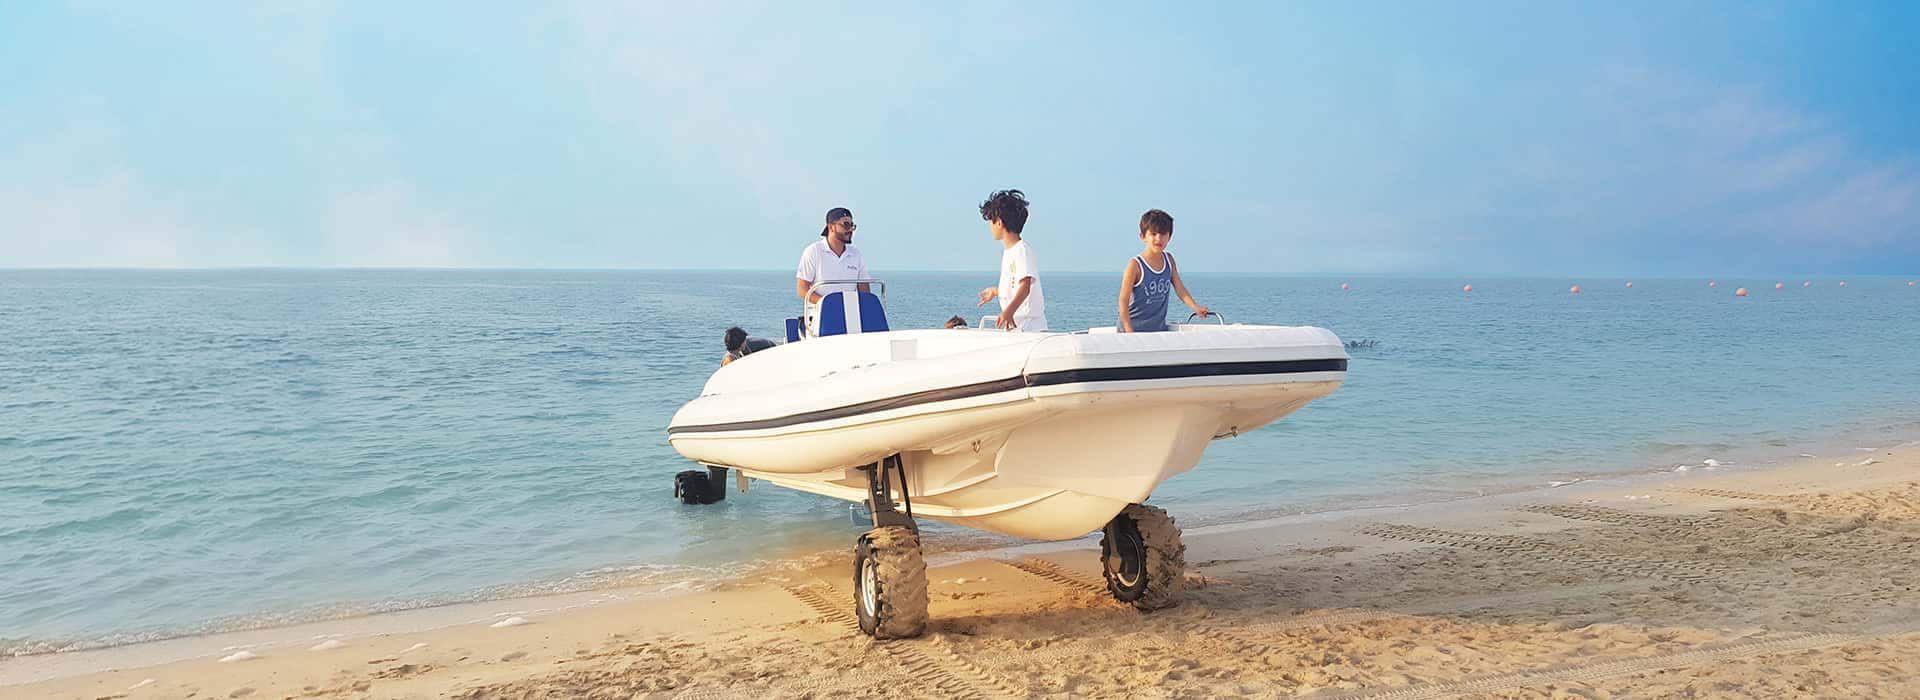 9.5M Amphibious Beachlander Boat